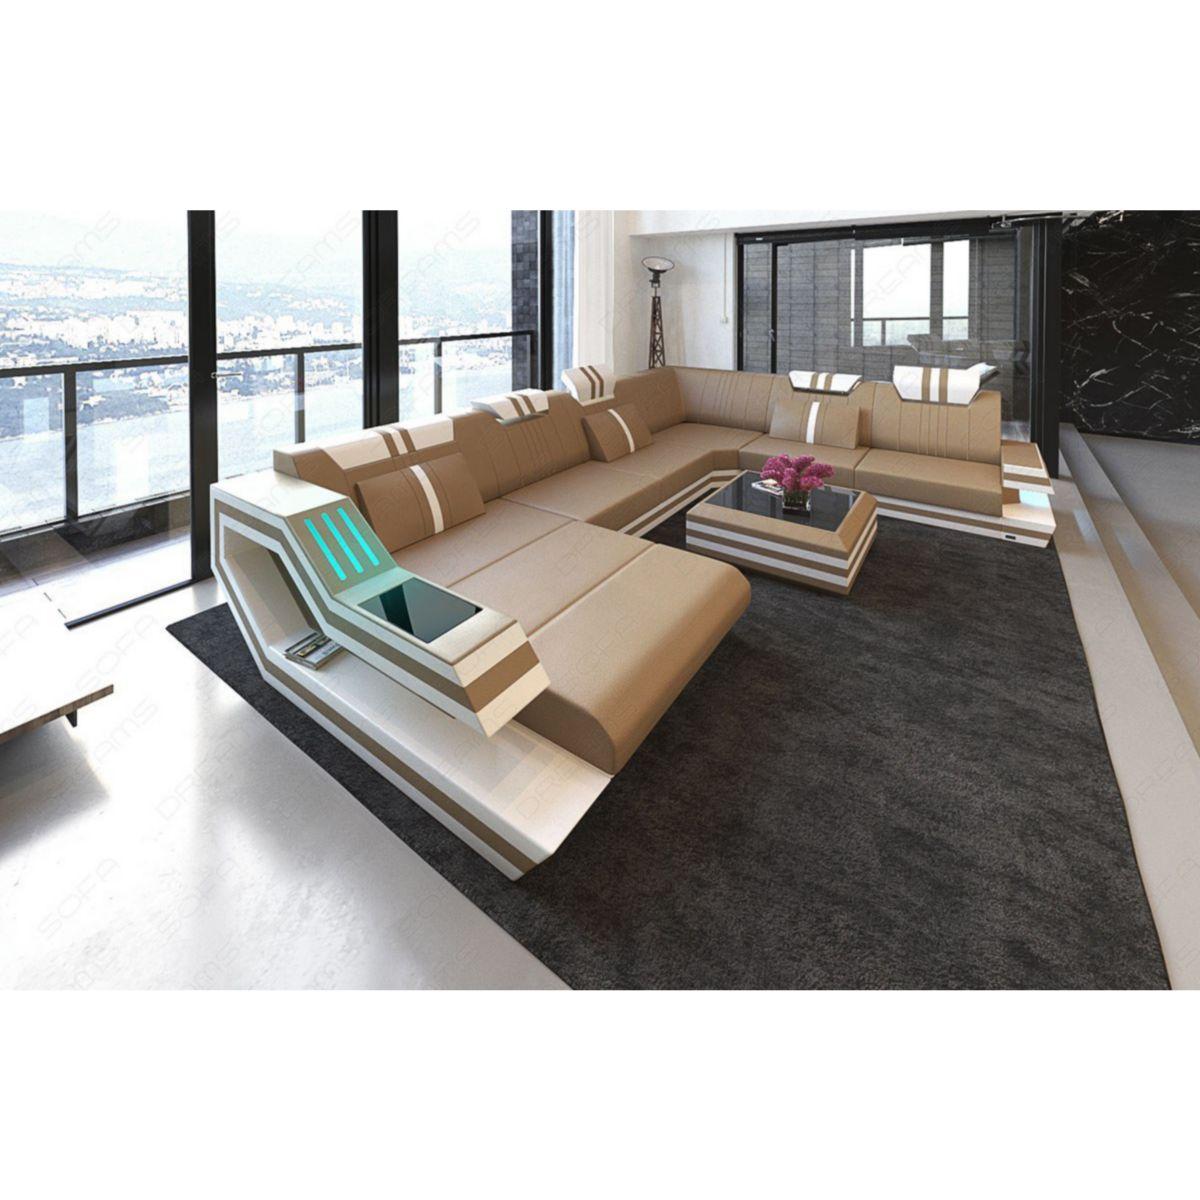 Sofa Dreams Wohnlandschaft Ravenna XXL jetztbilligerkaufen